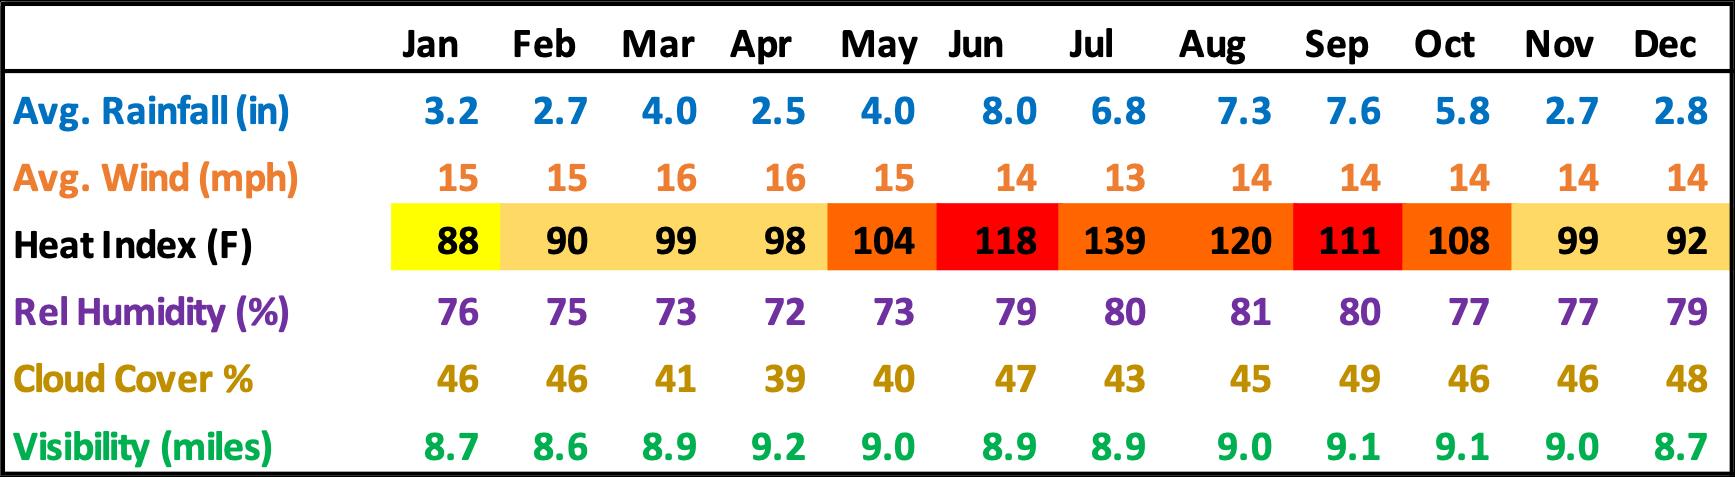 New Smyrna Beach Florida Average Rainfall Wind Humidity Clouds Visibility